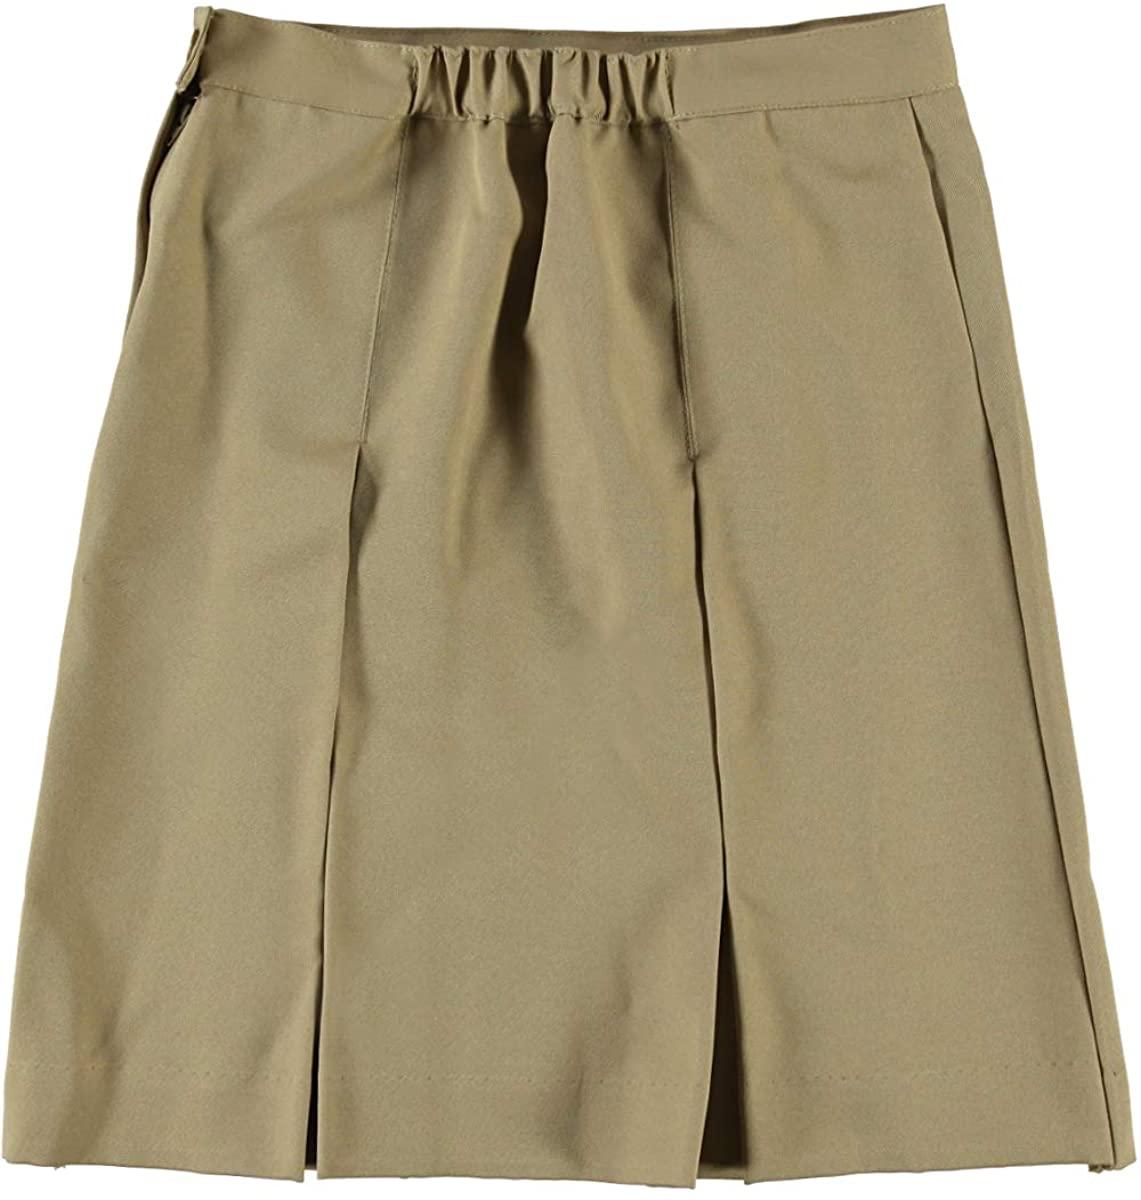 Cookie's Big Girls Pleated Skirt - Khaki, 14